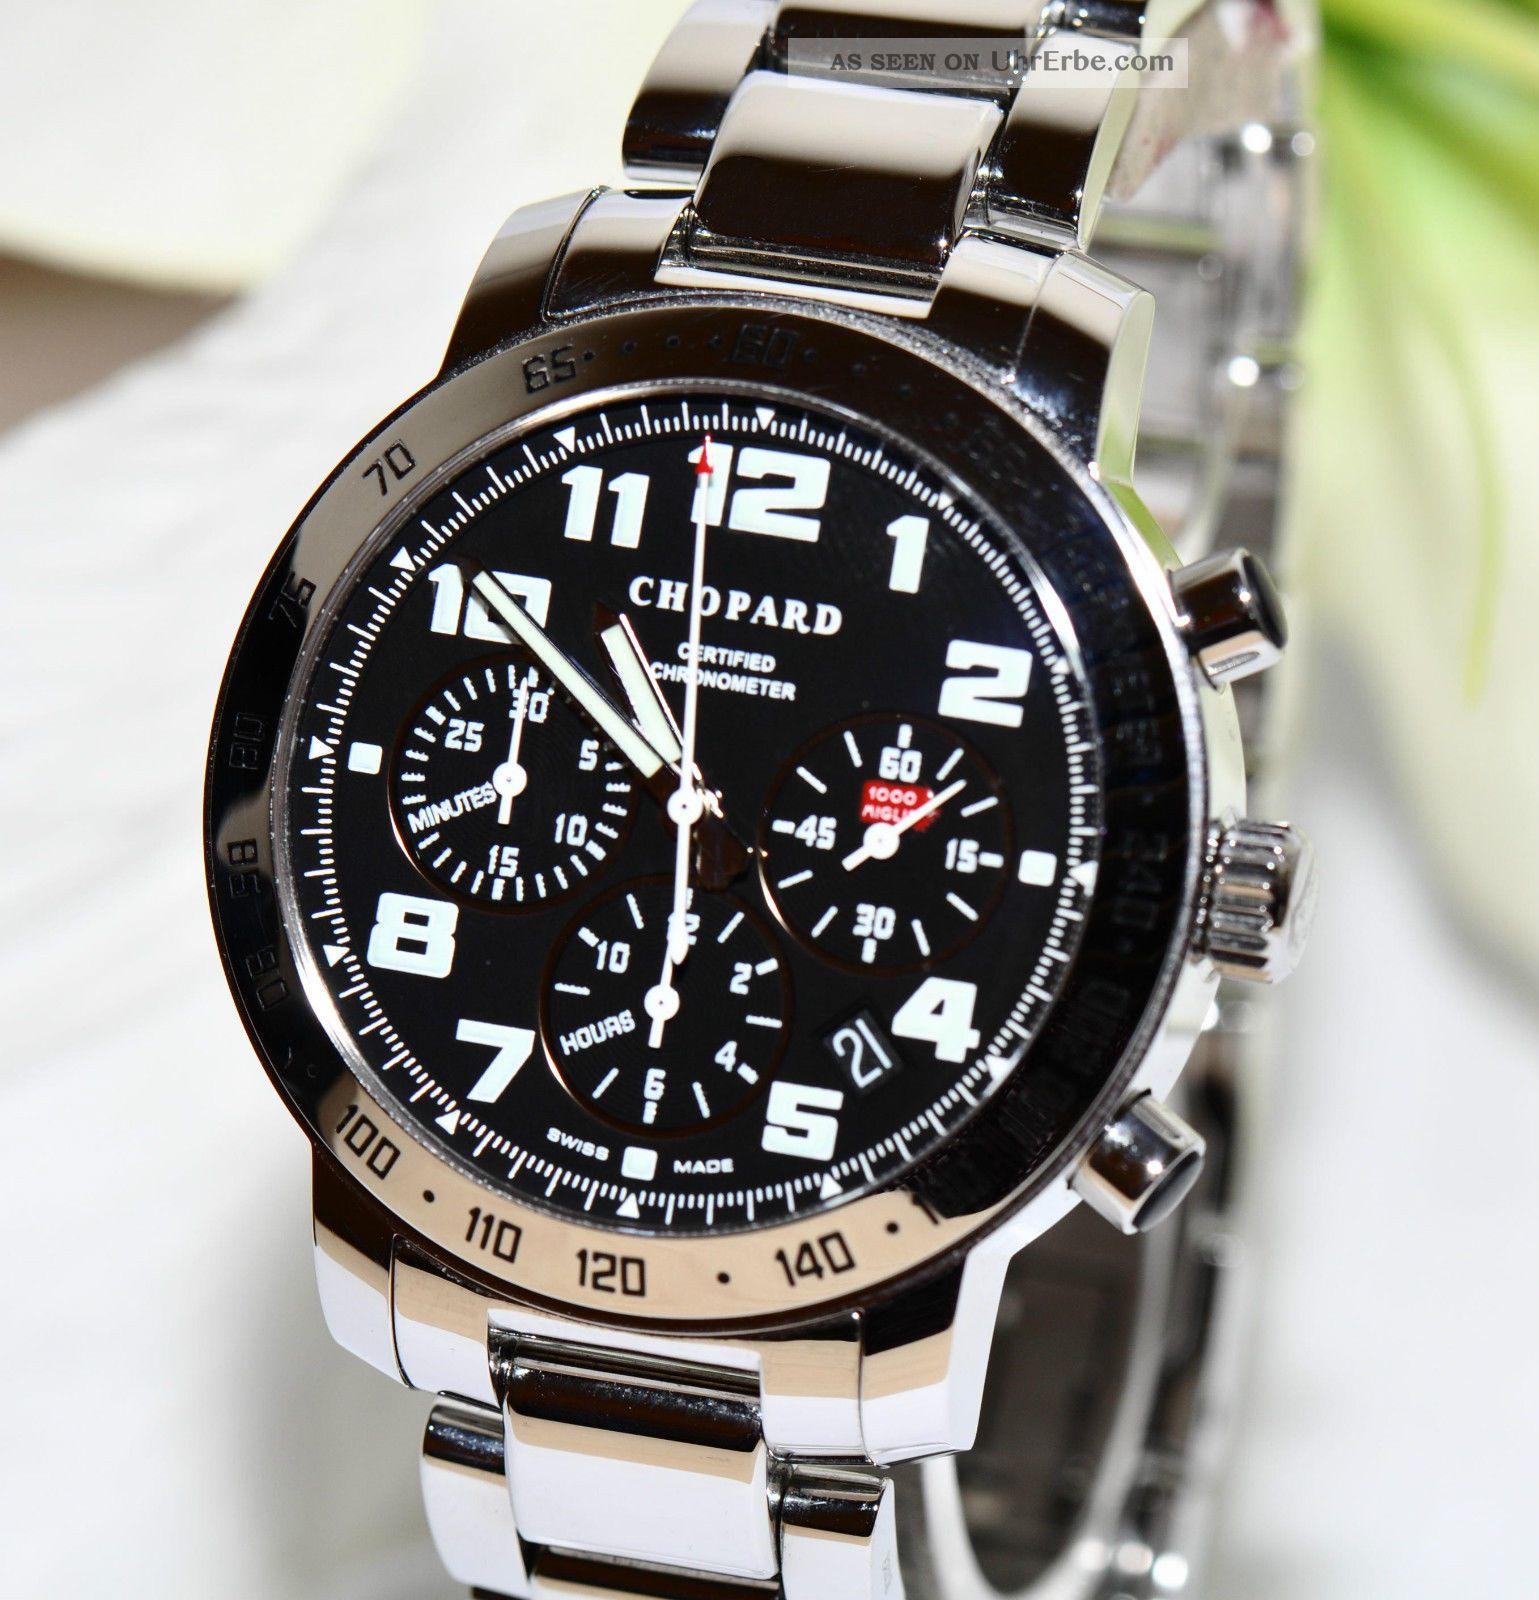 Chopard Mille Miglia Chronograph 8920 Stahl Papiere Box 2012 Armbanduhren Bild